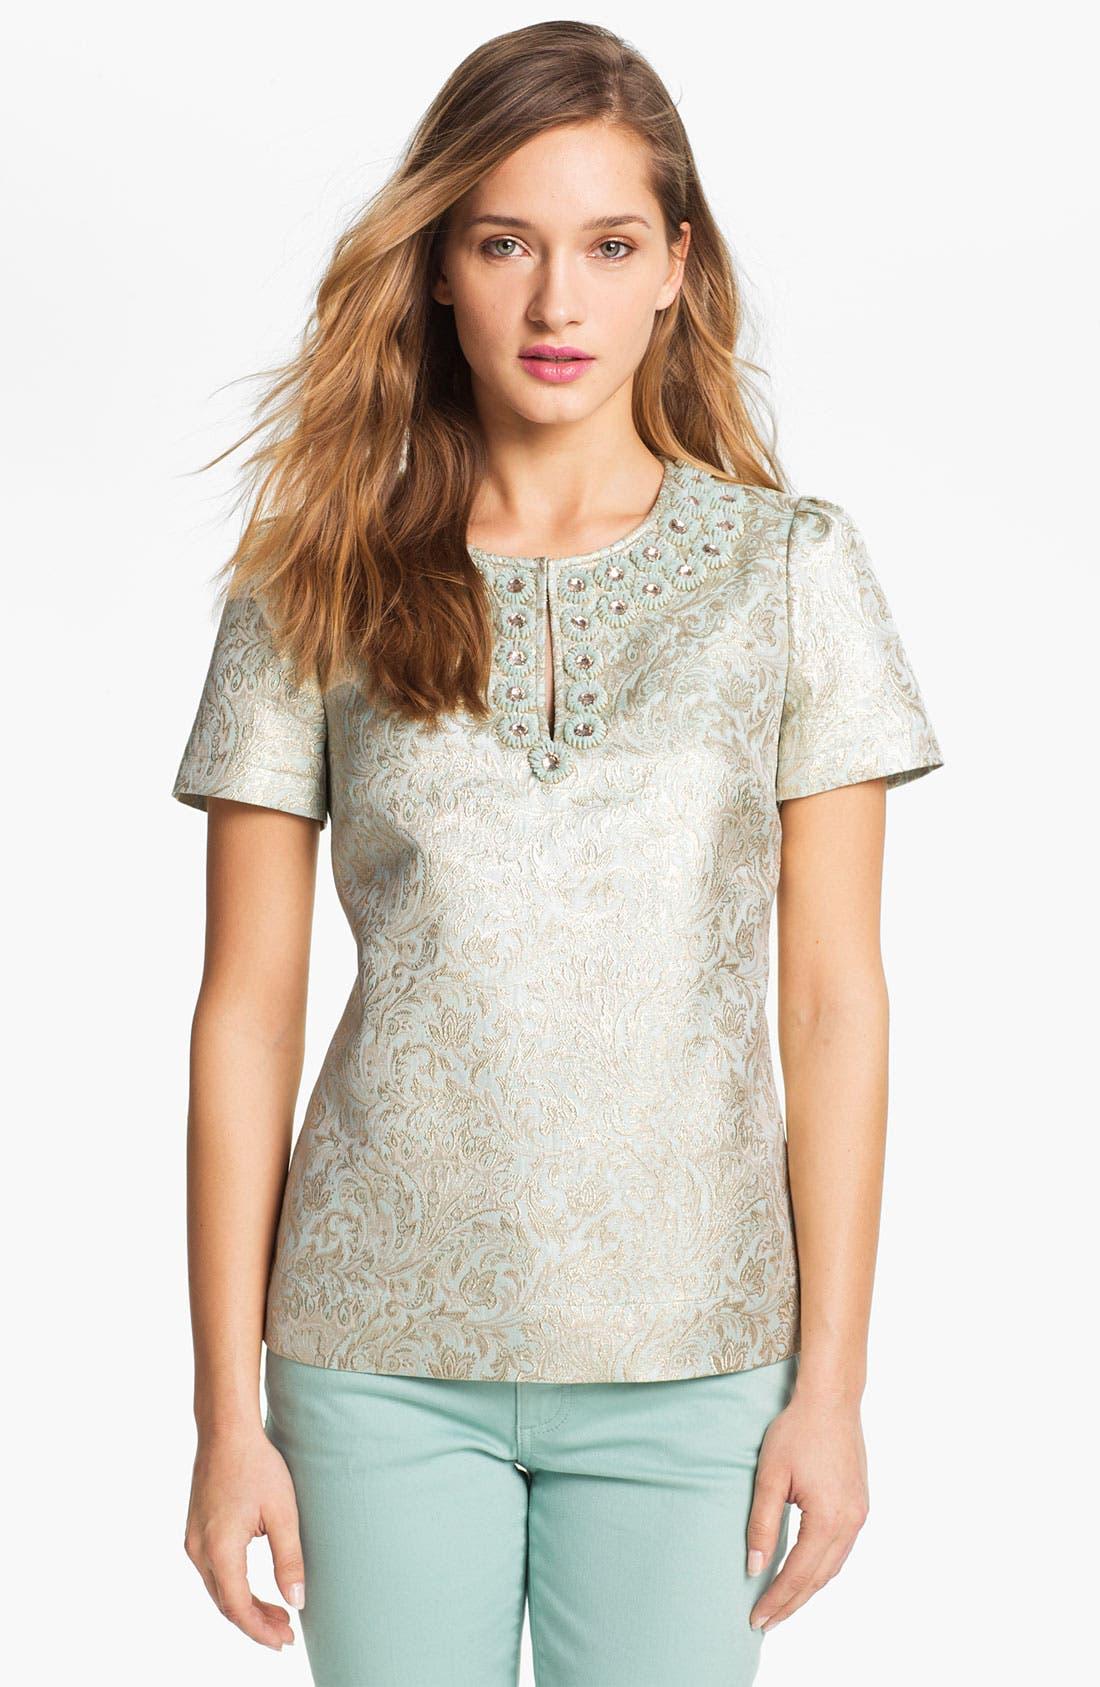 Main Image - Tory Burch 'Lola' Metallic Silk Top